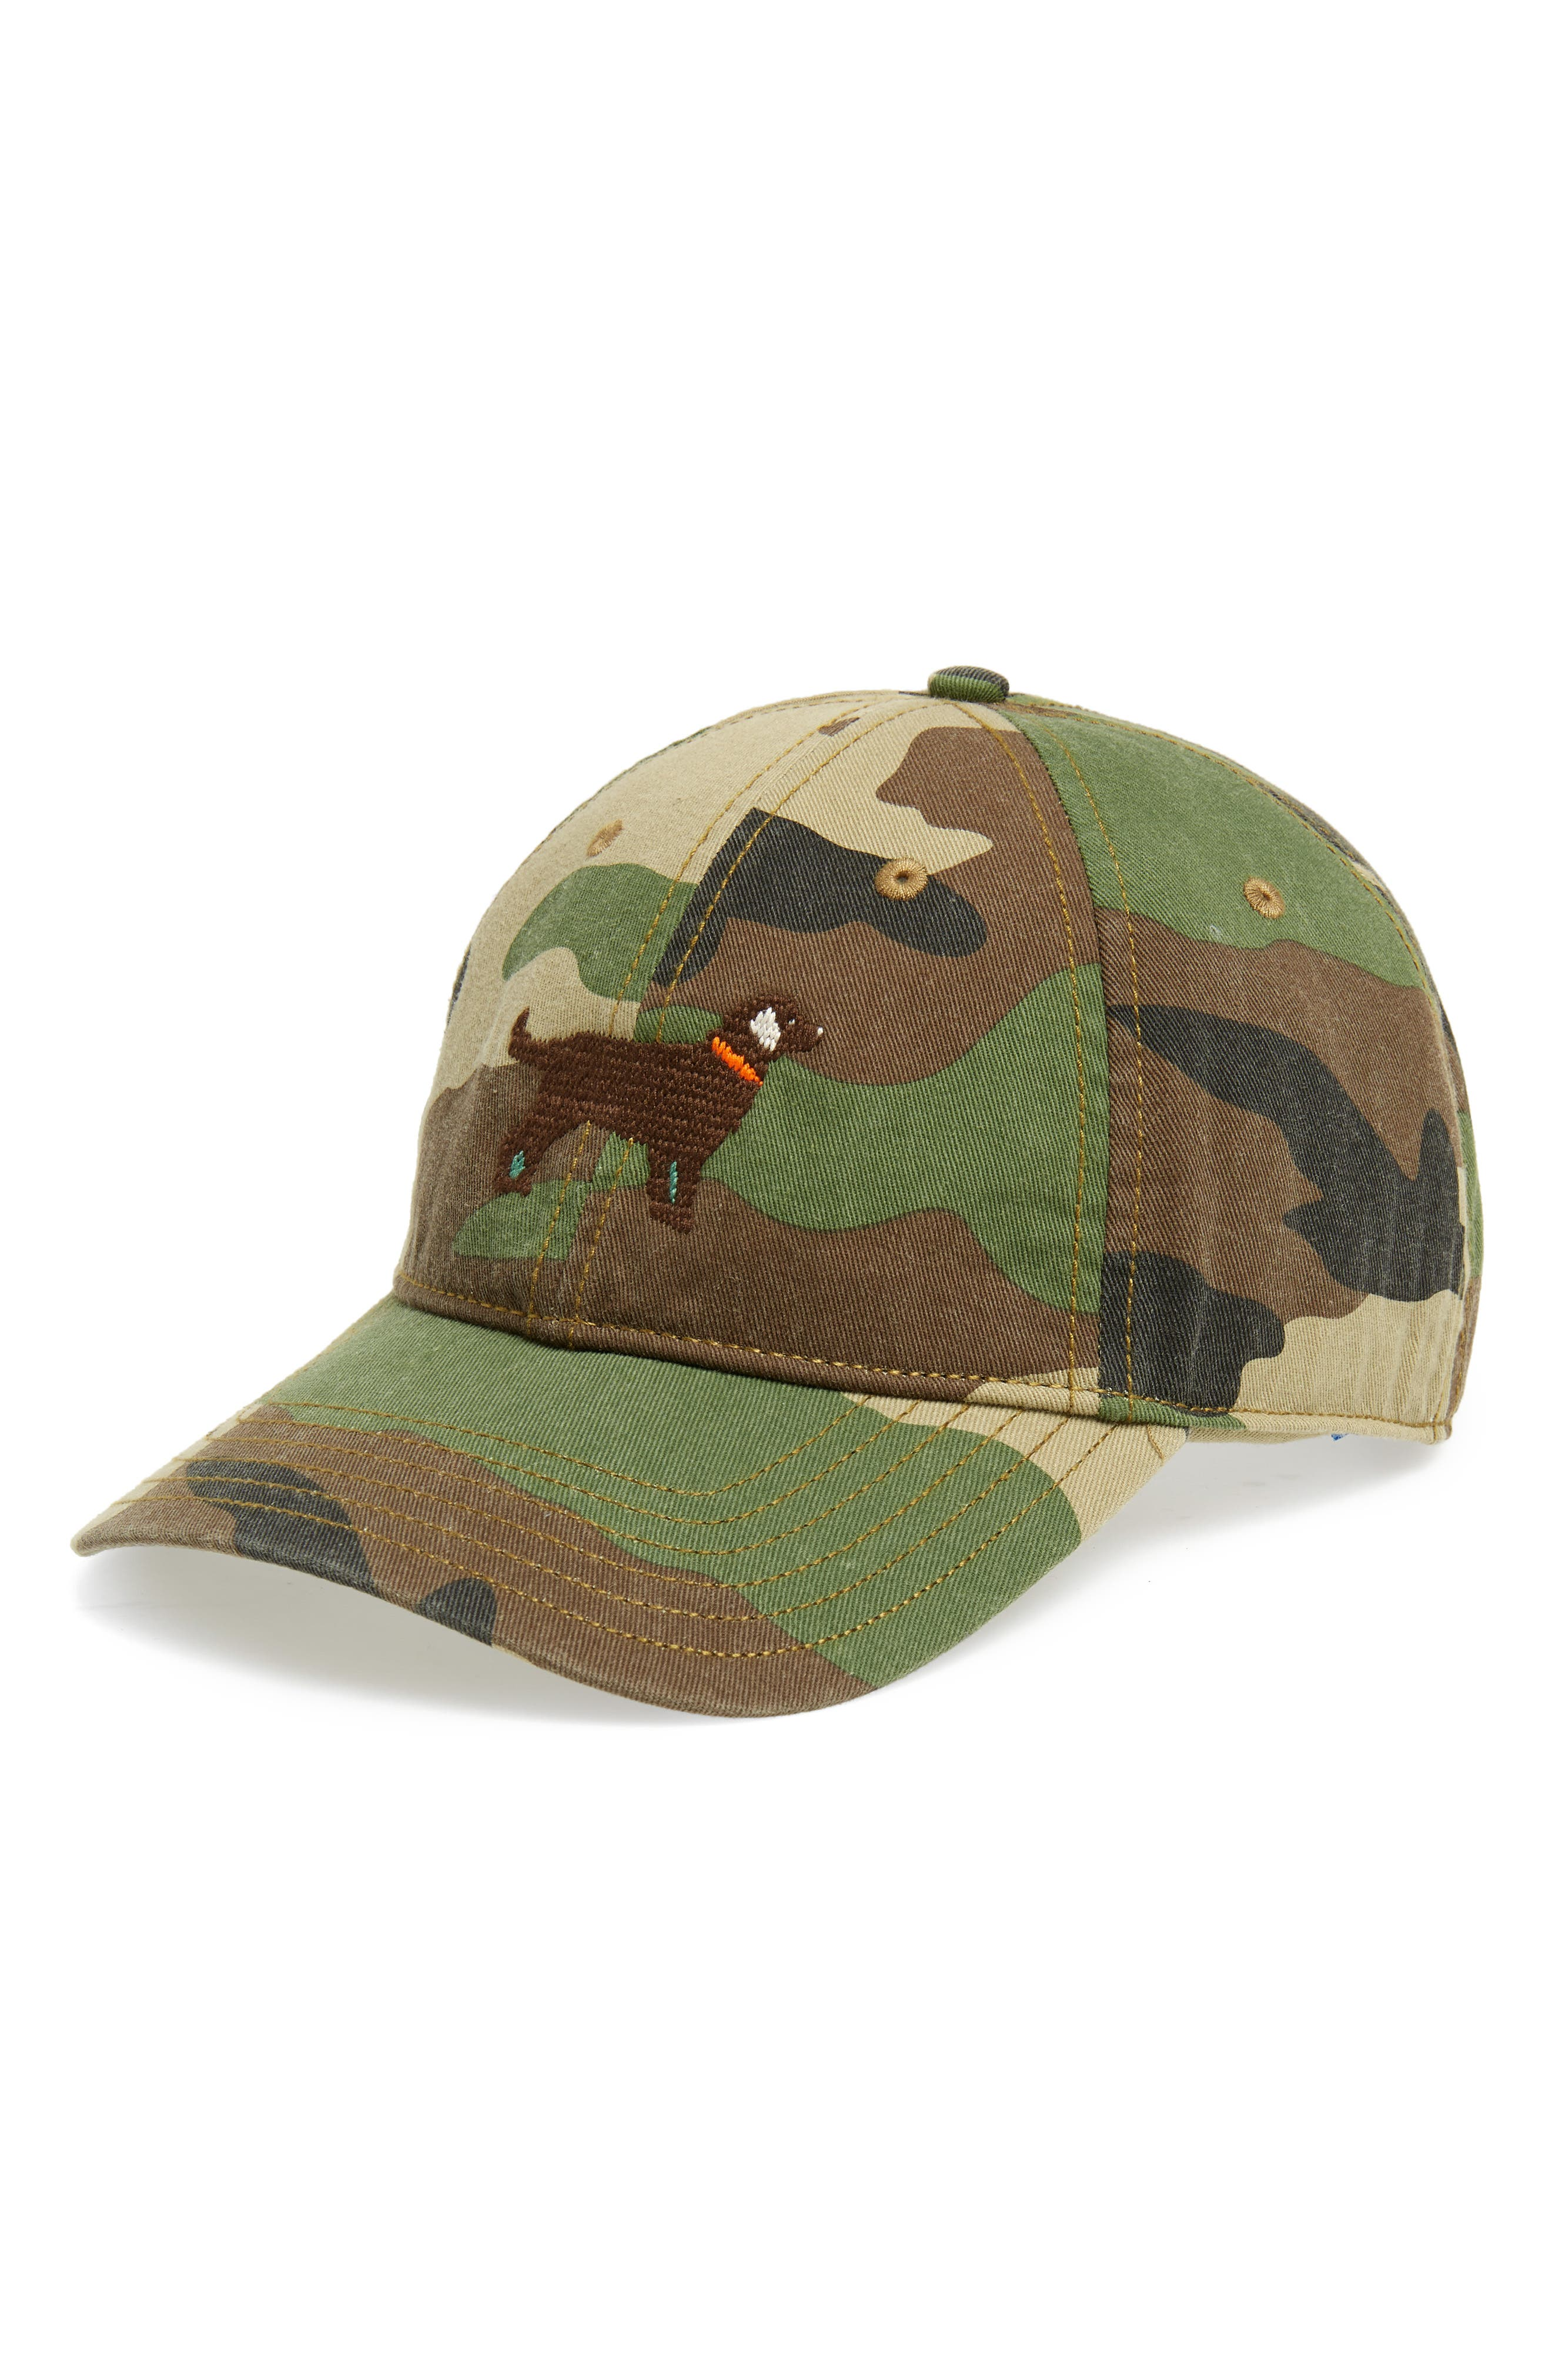 HARDING-LANE Chocolate Lab Baseball Cap, Main, color, 300